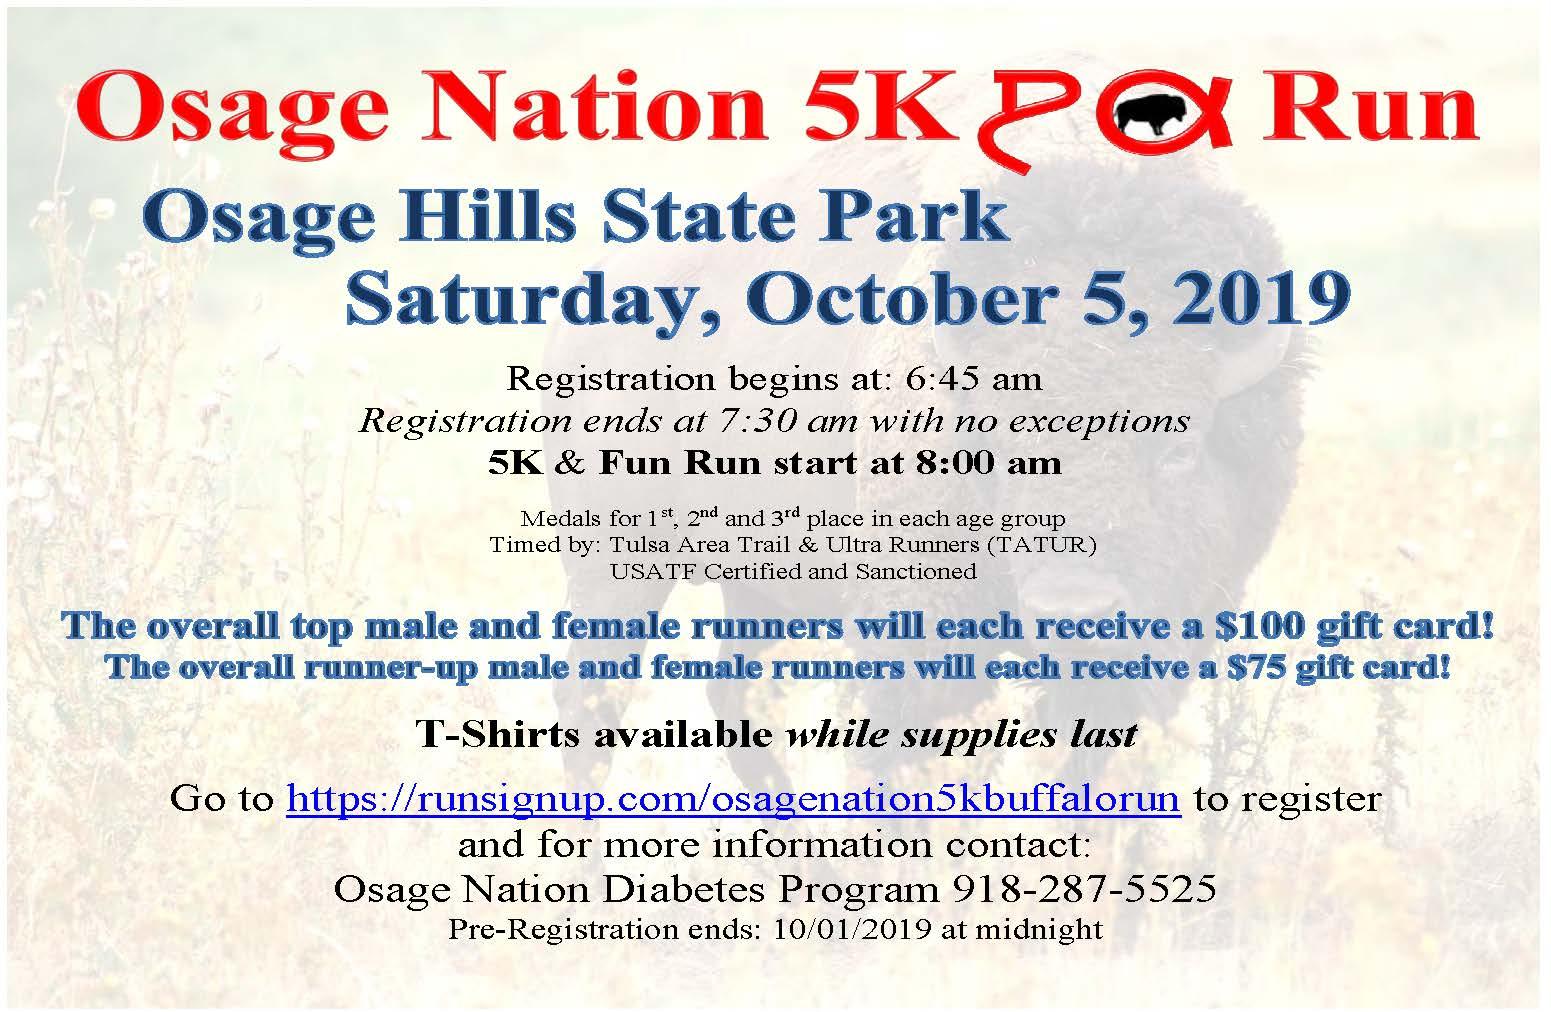 Osage Nation 5K Run flyer